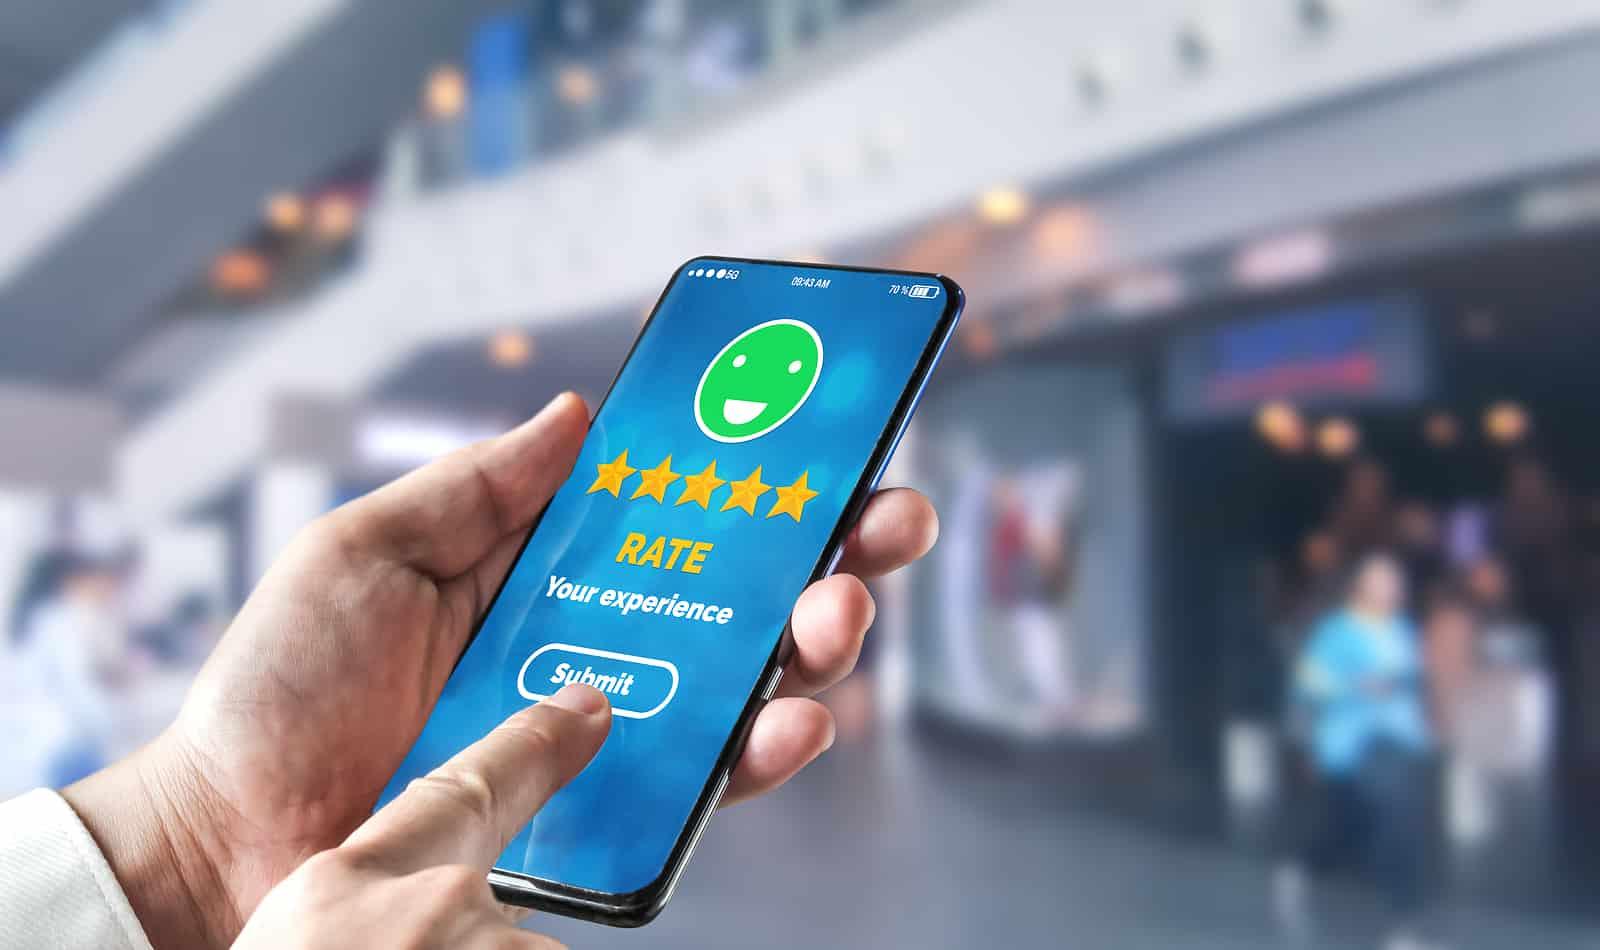 Customer review satisfaction feedback survey concept